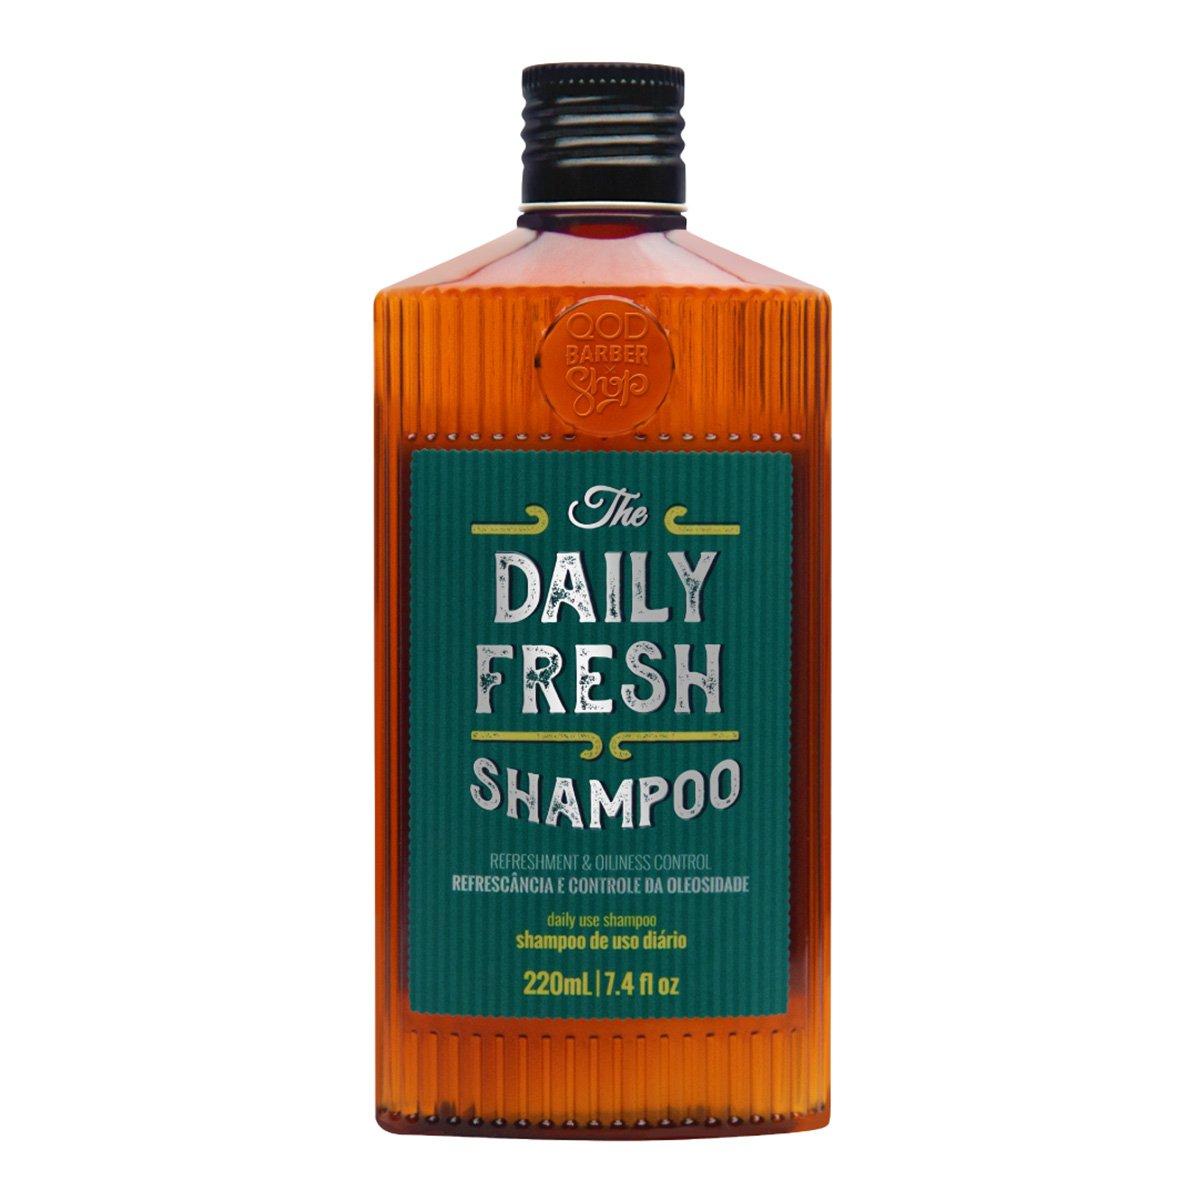 Shampoo QOD Barber Shop Daily 220ml